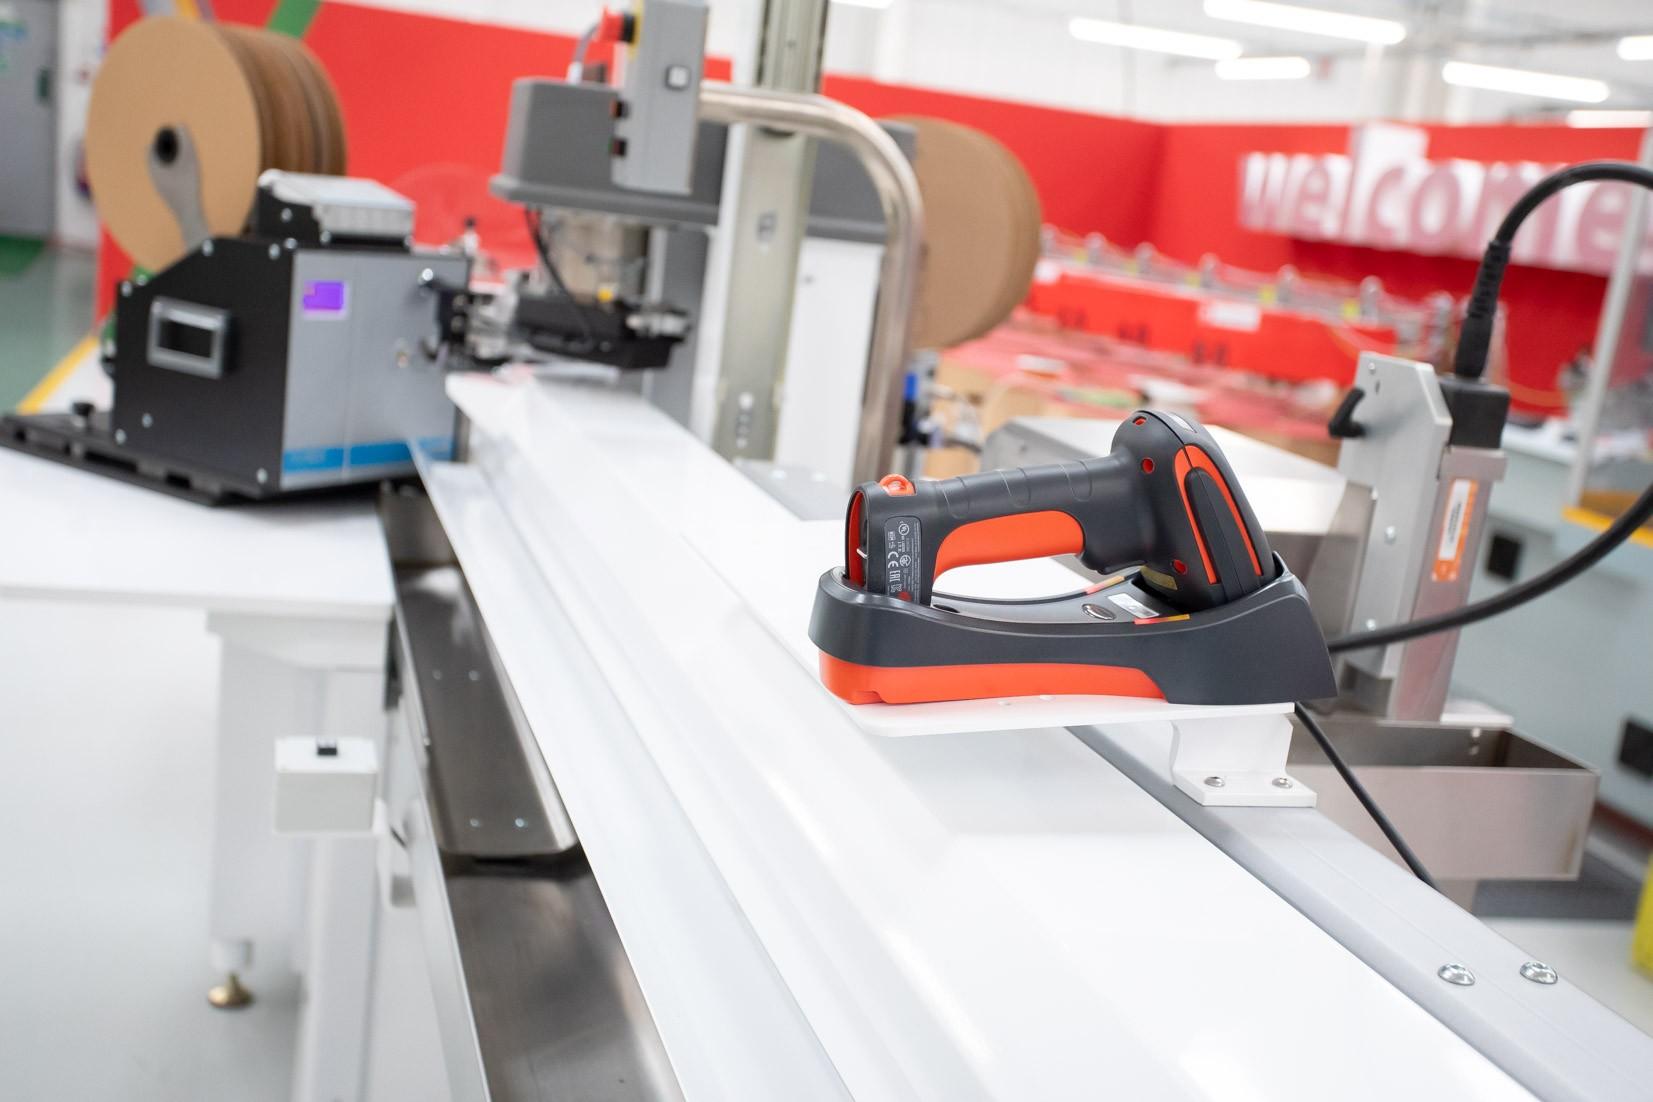 Build quality & test » artos 15 » PP Control & Automation